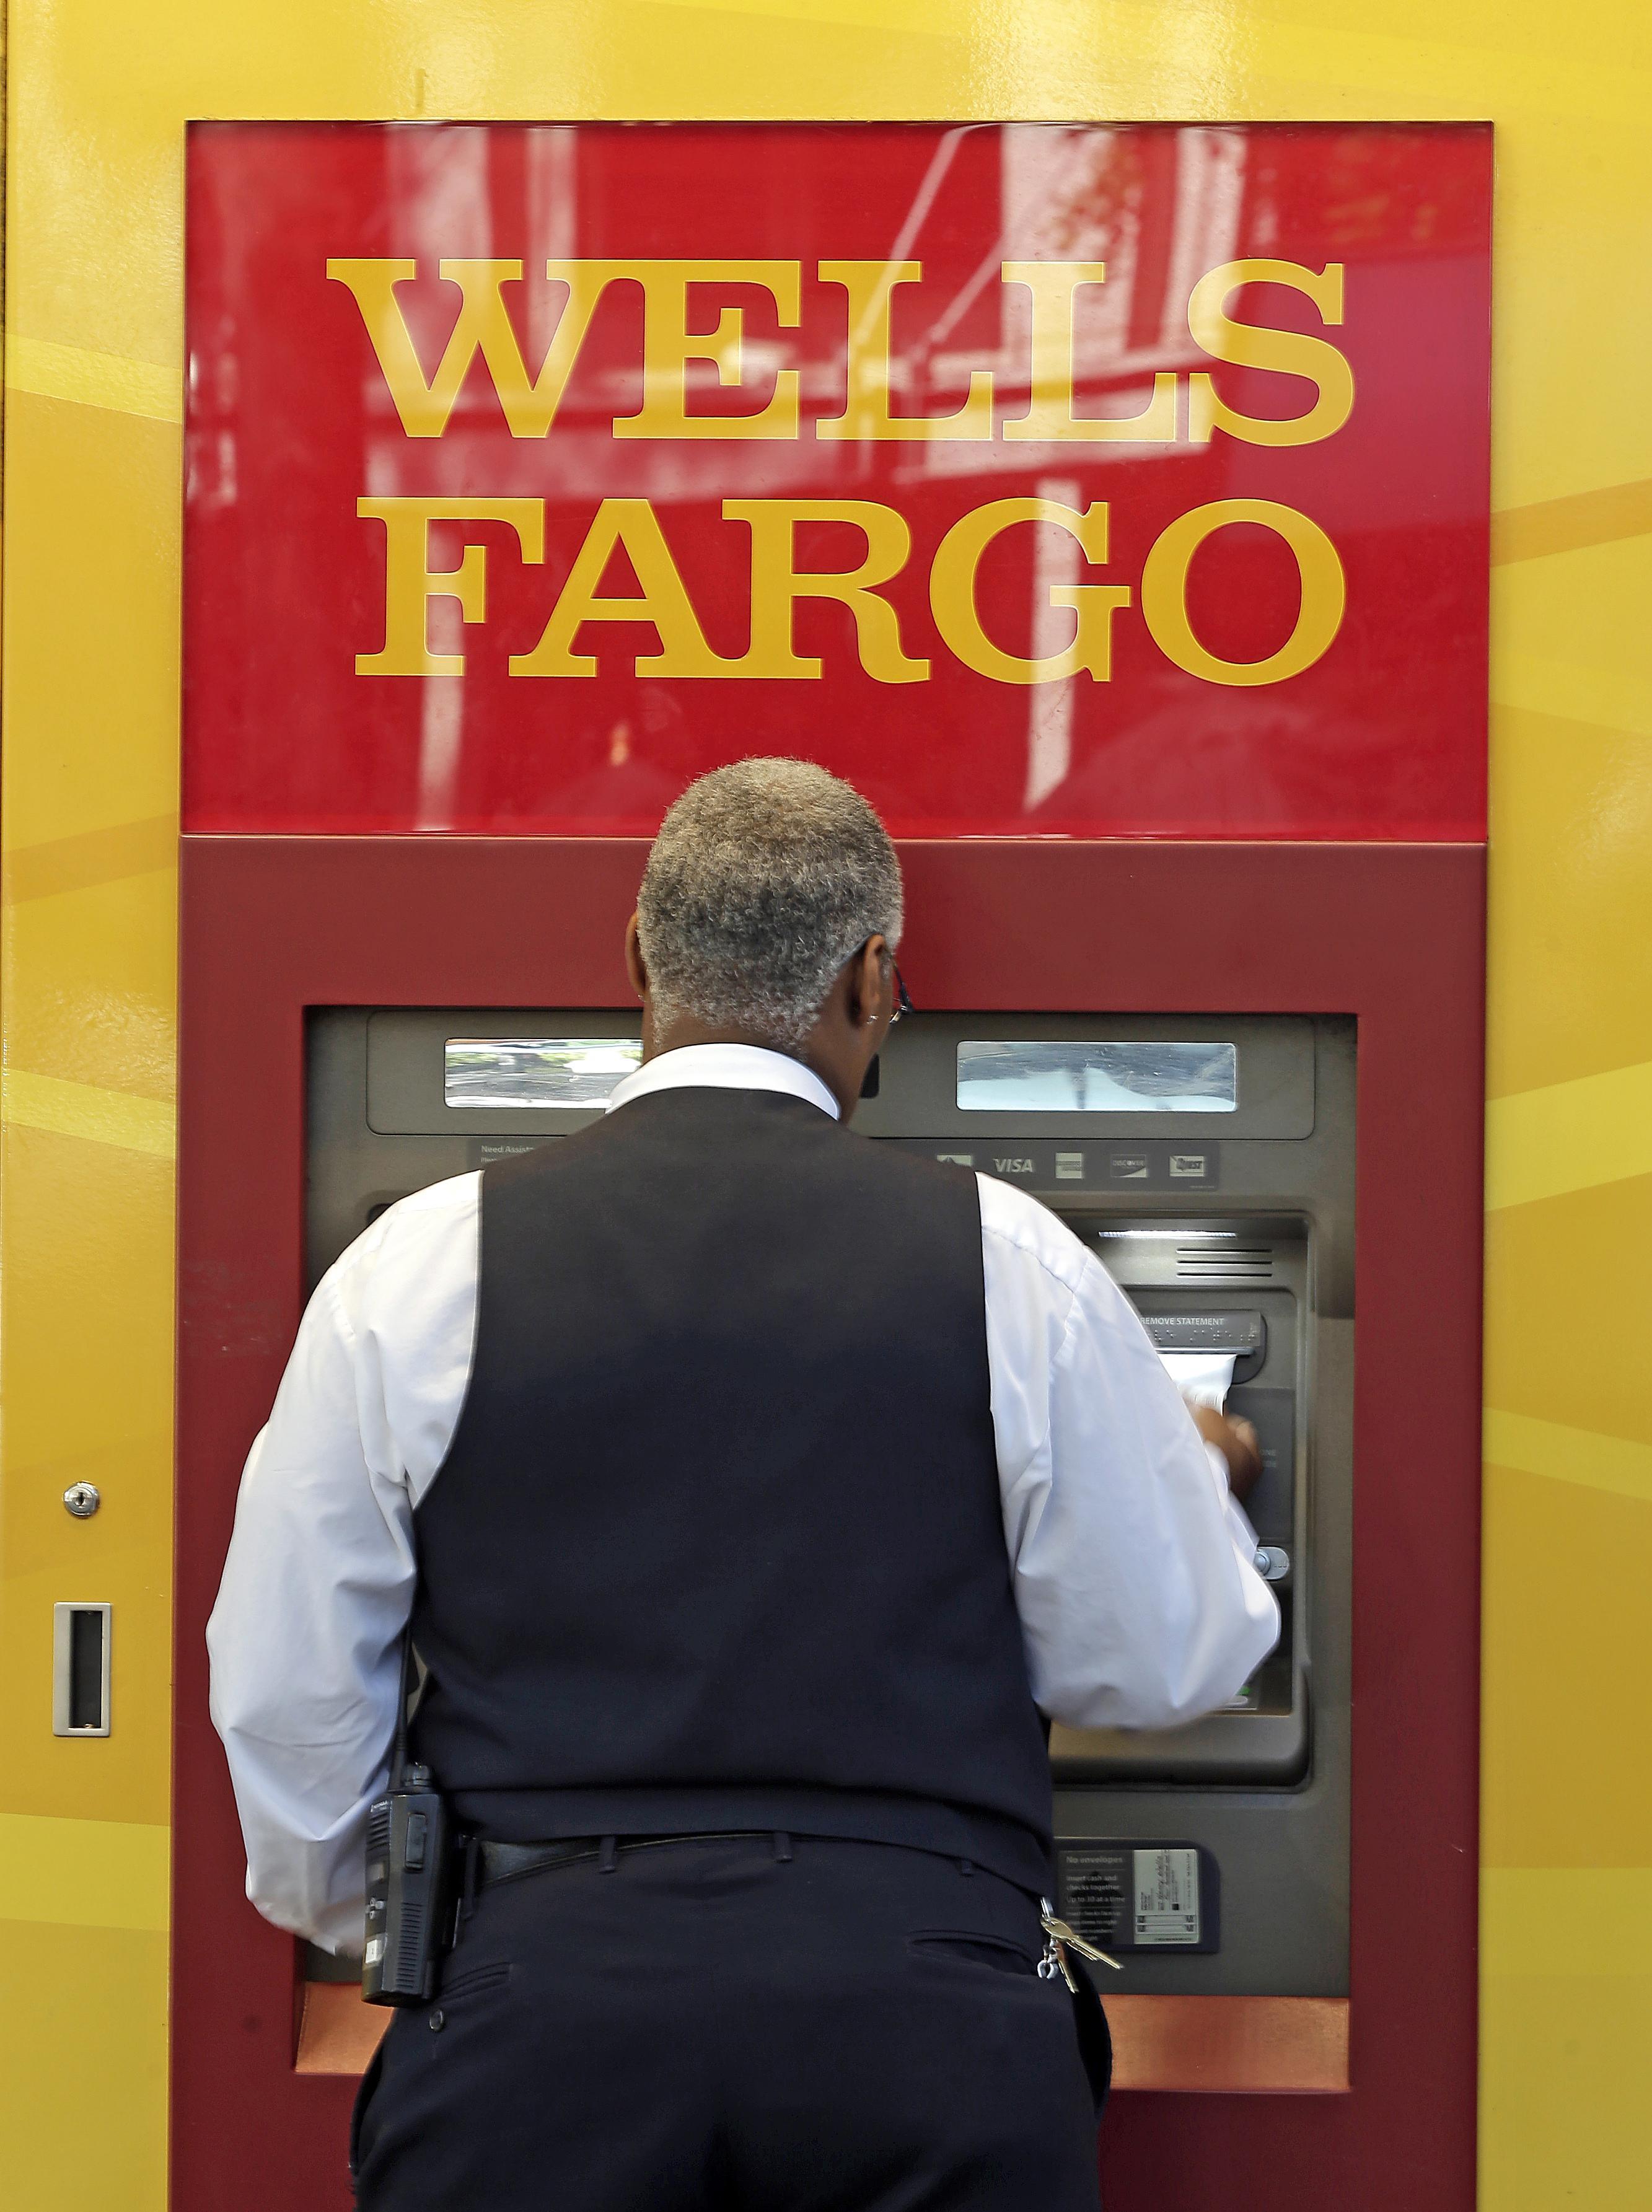 Wells Fargo's 2Q profit rises along with interest rates